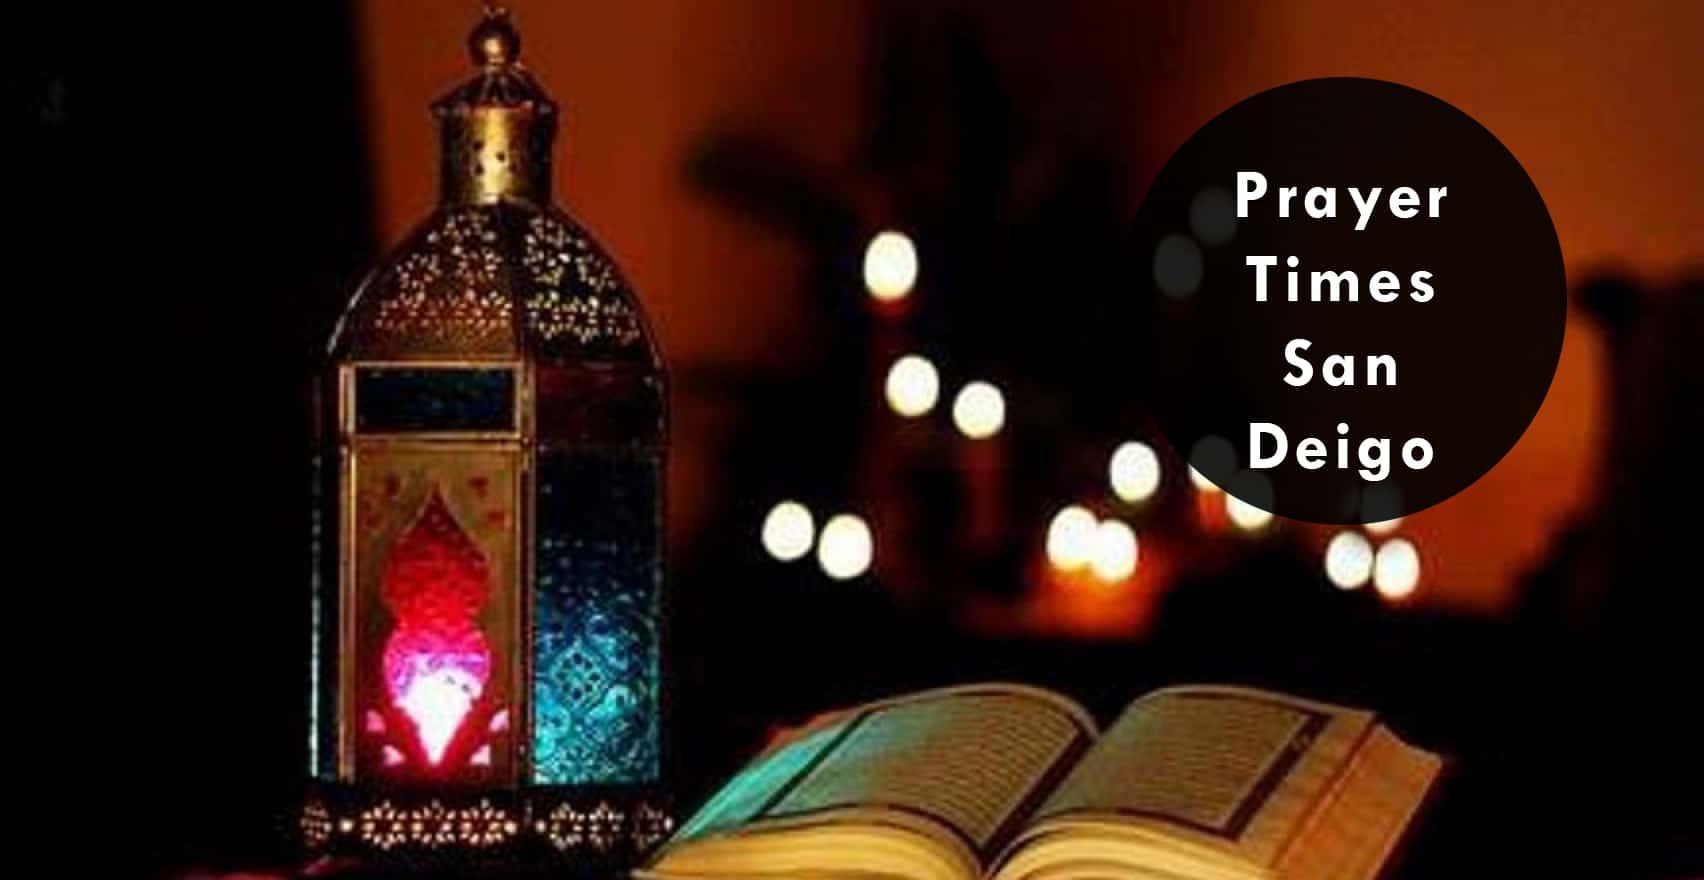 prayer times San Diego